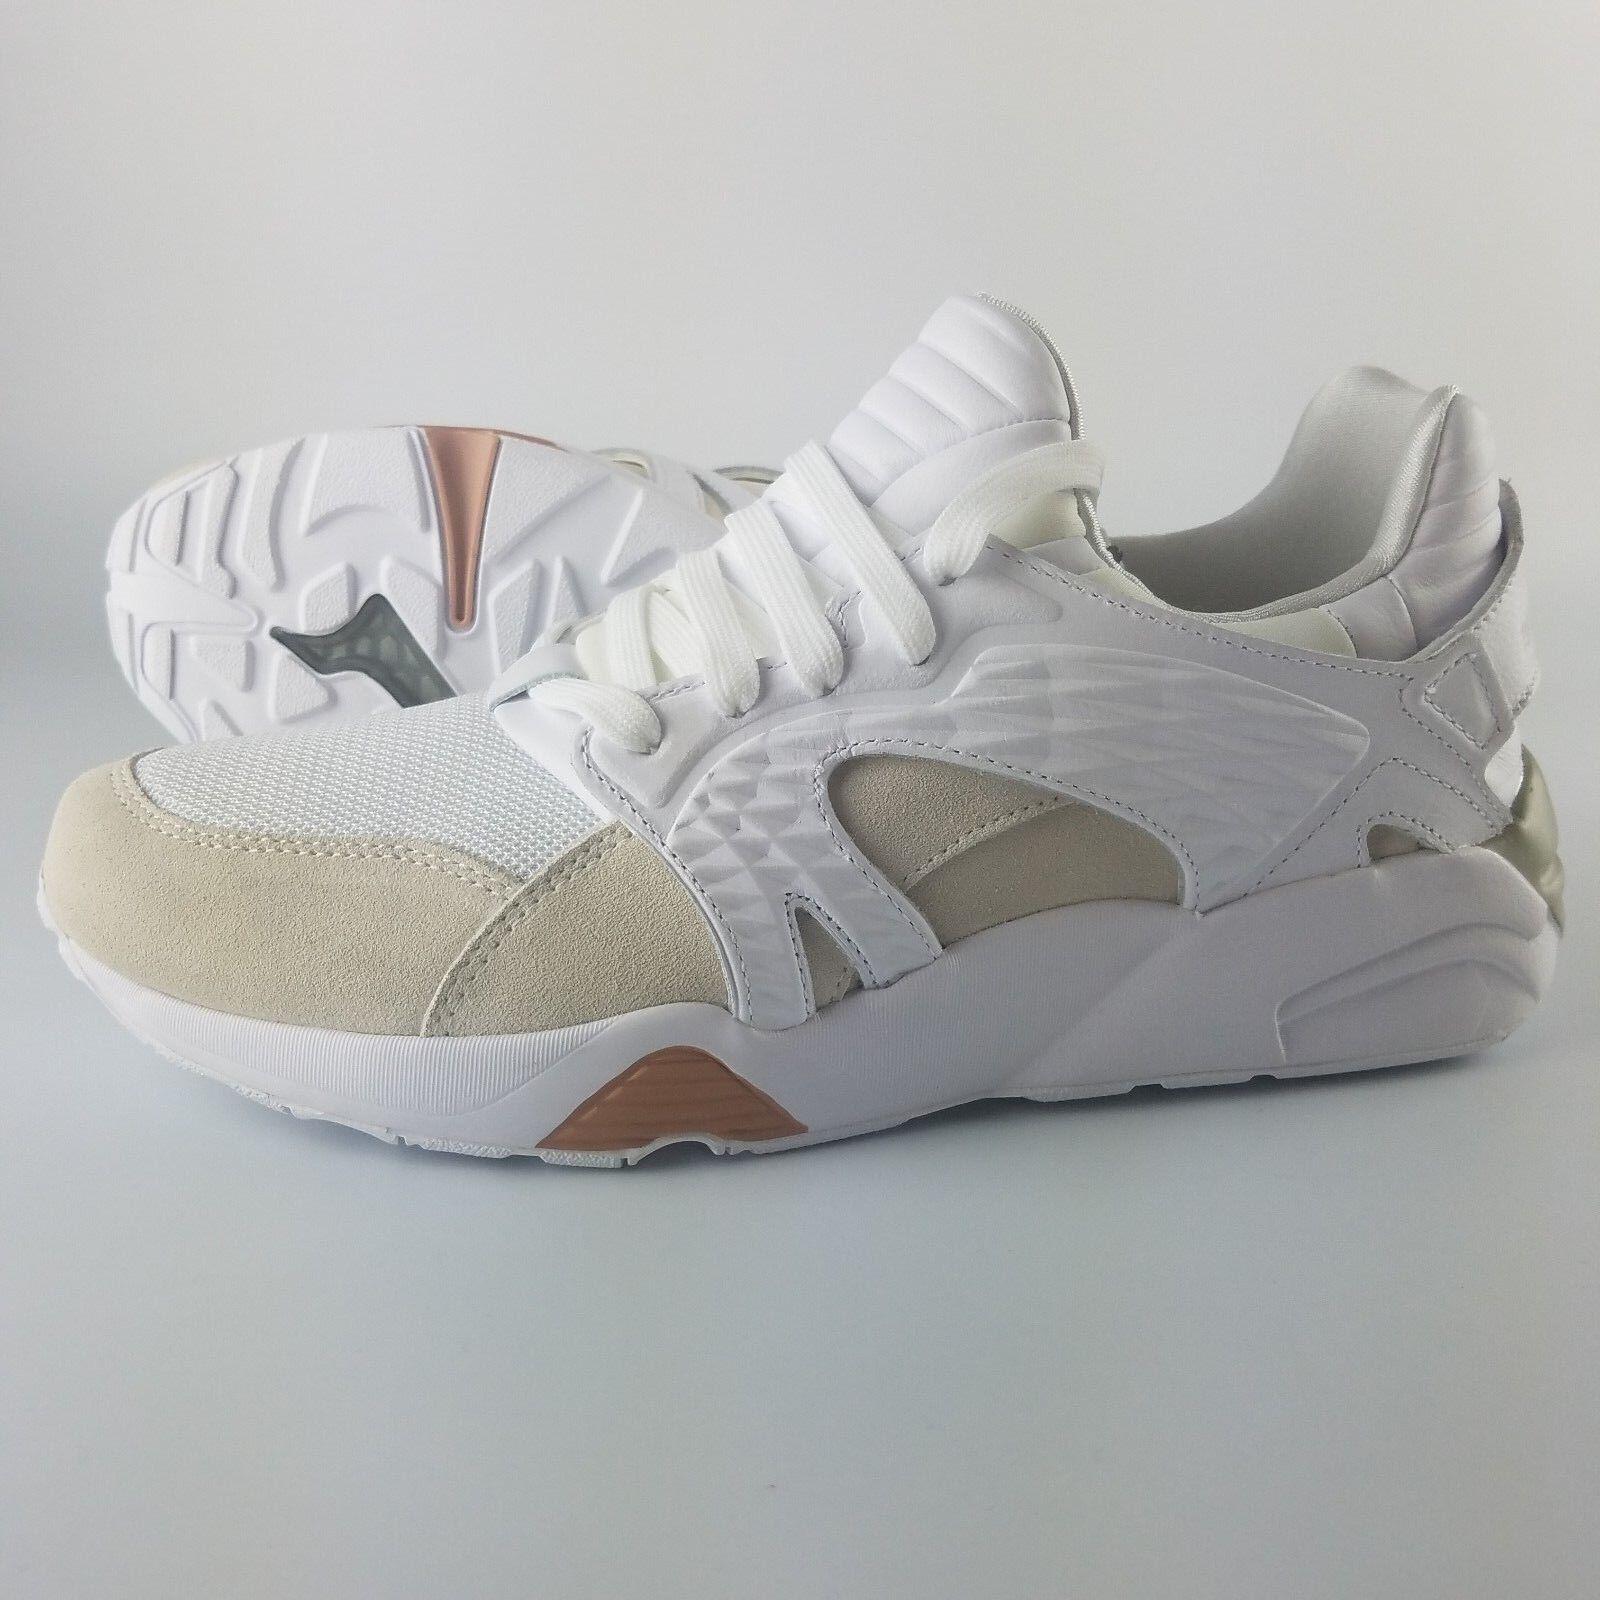 Puma Han Kjobenhavn Blaze Cage Cage Cage X Uomo Dimensione 10 US Athletic scarpe bianca Tan 93270d